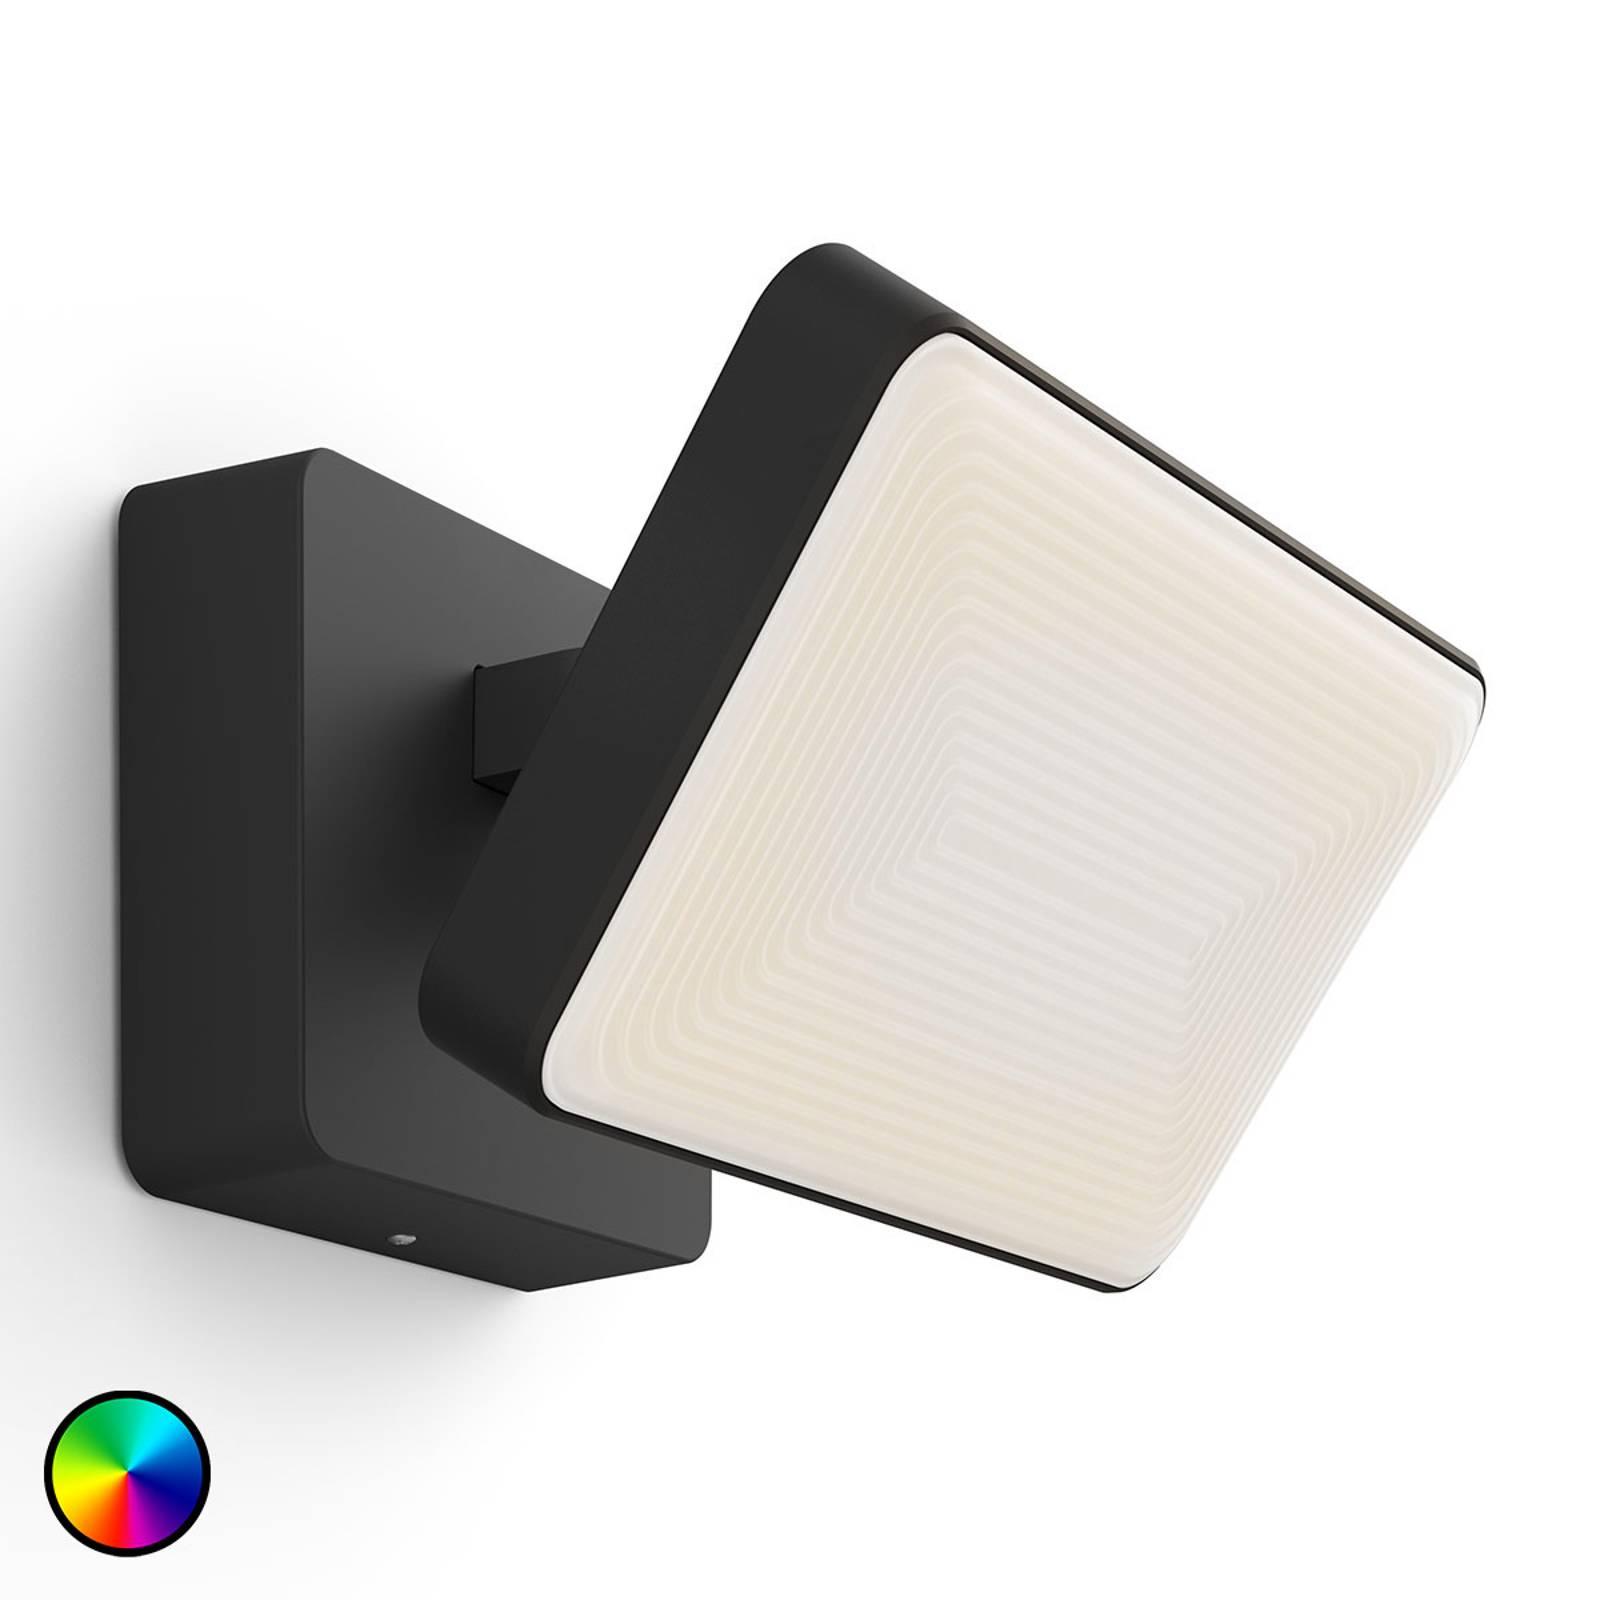 Philips Hue White+Color Discover LEDkohdevalo ulos